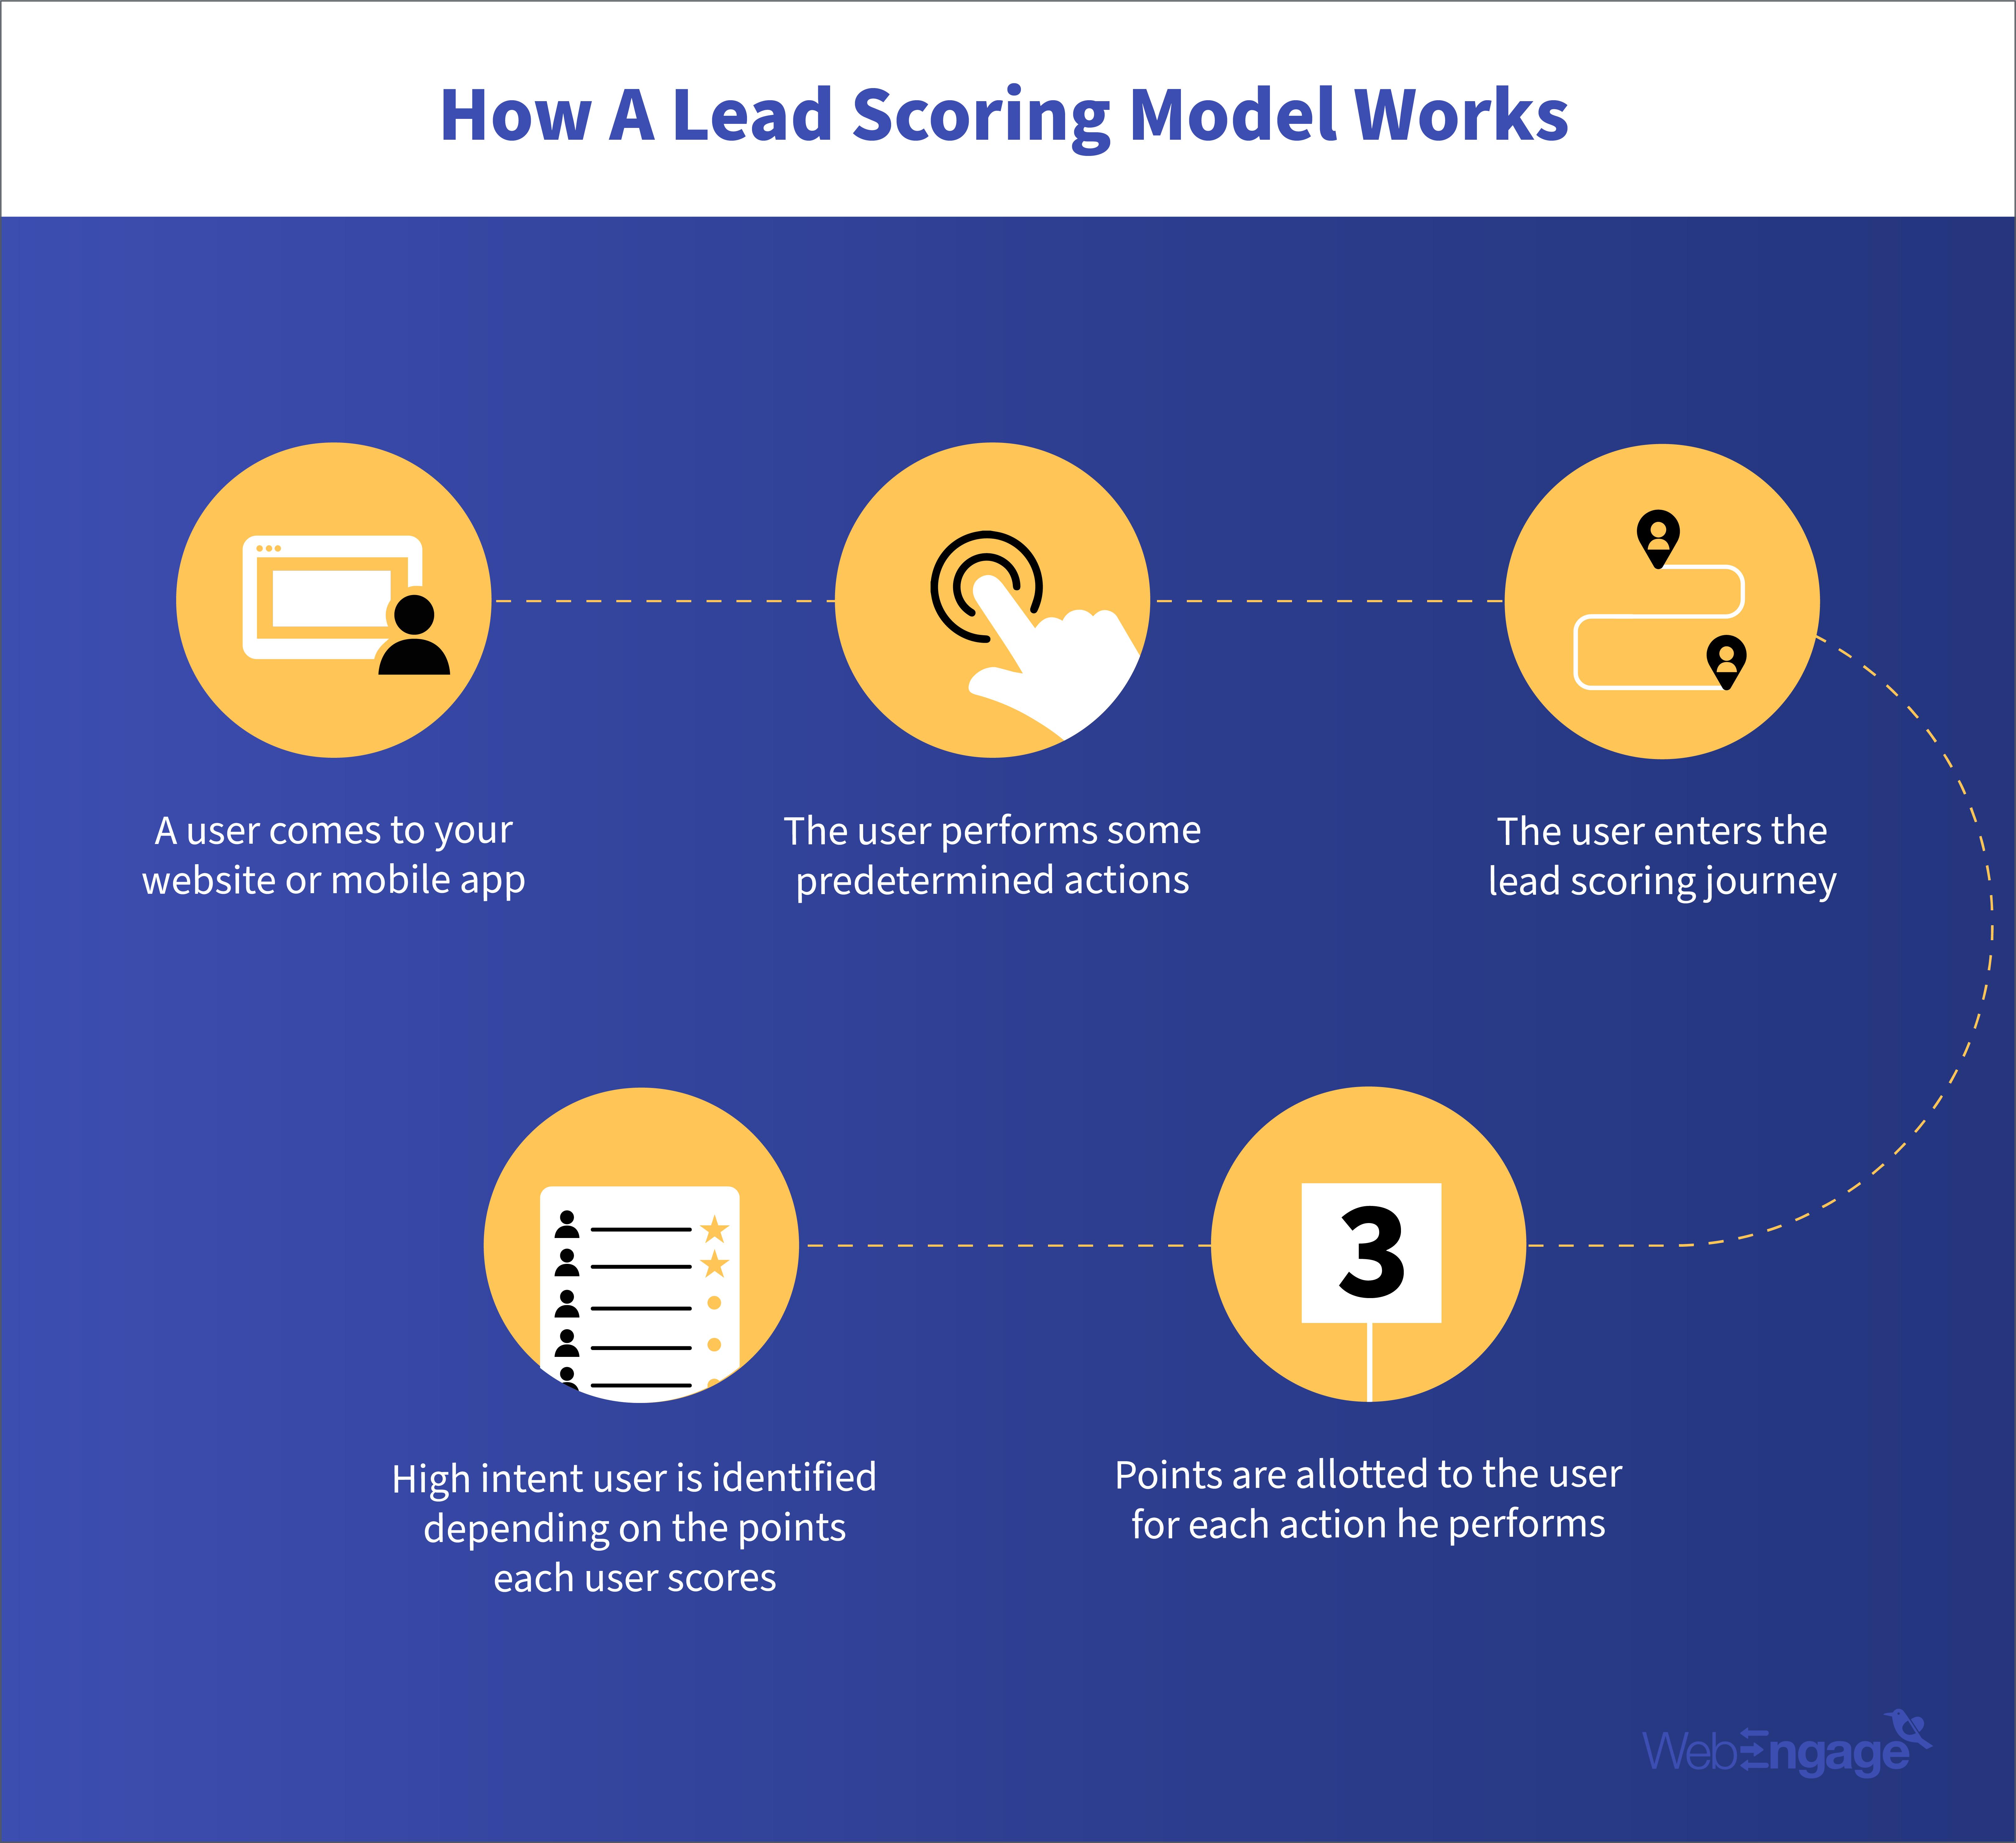 working of a lead scoring model